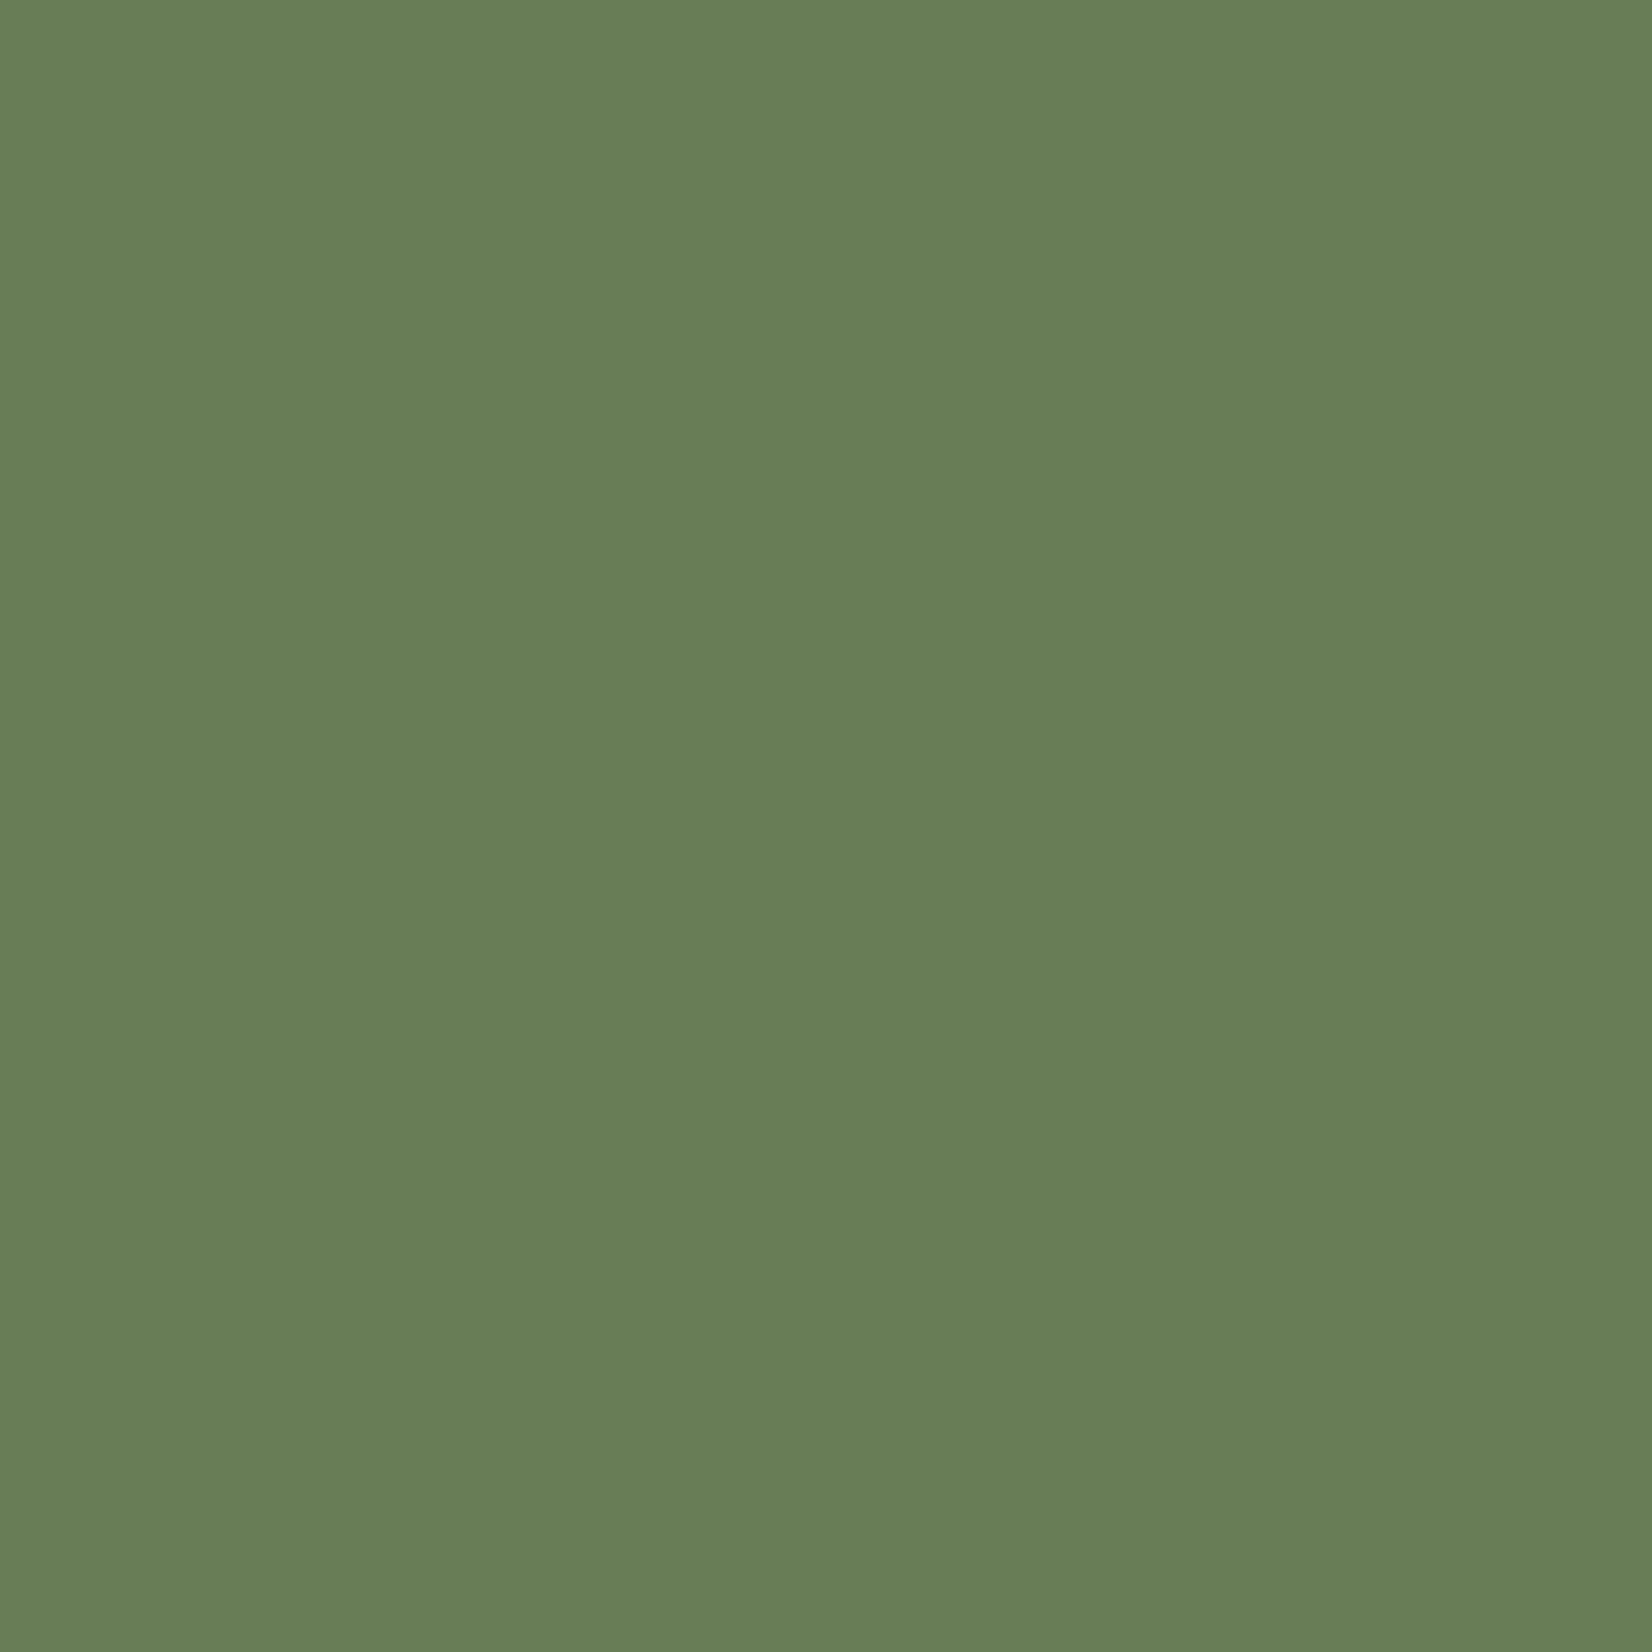 ART GALLERY PURE ELEMENTS, PATINA GREEN (PE-447)PER CM $16/M